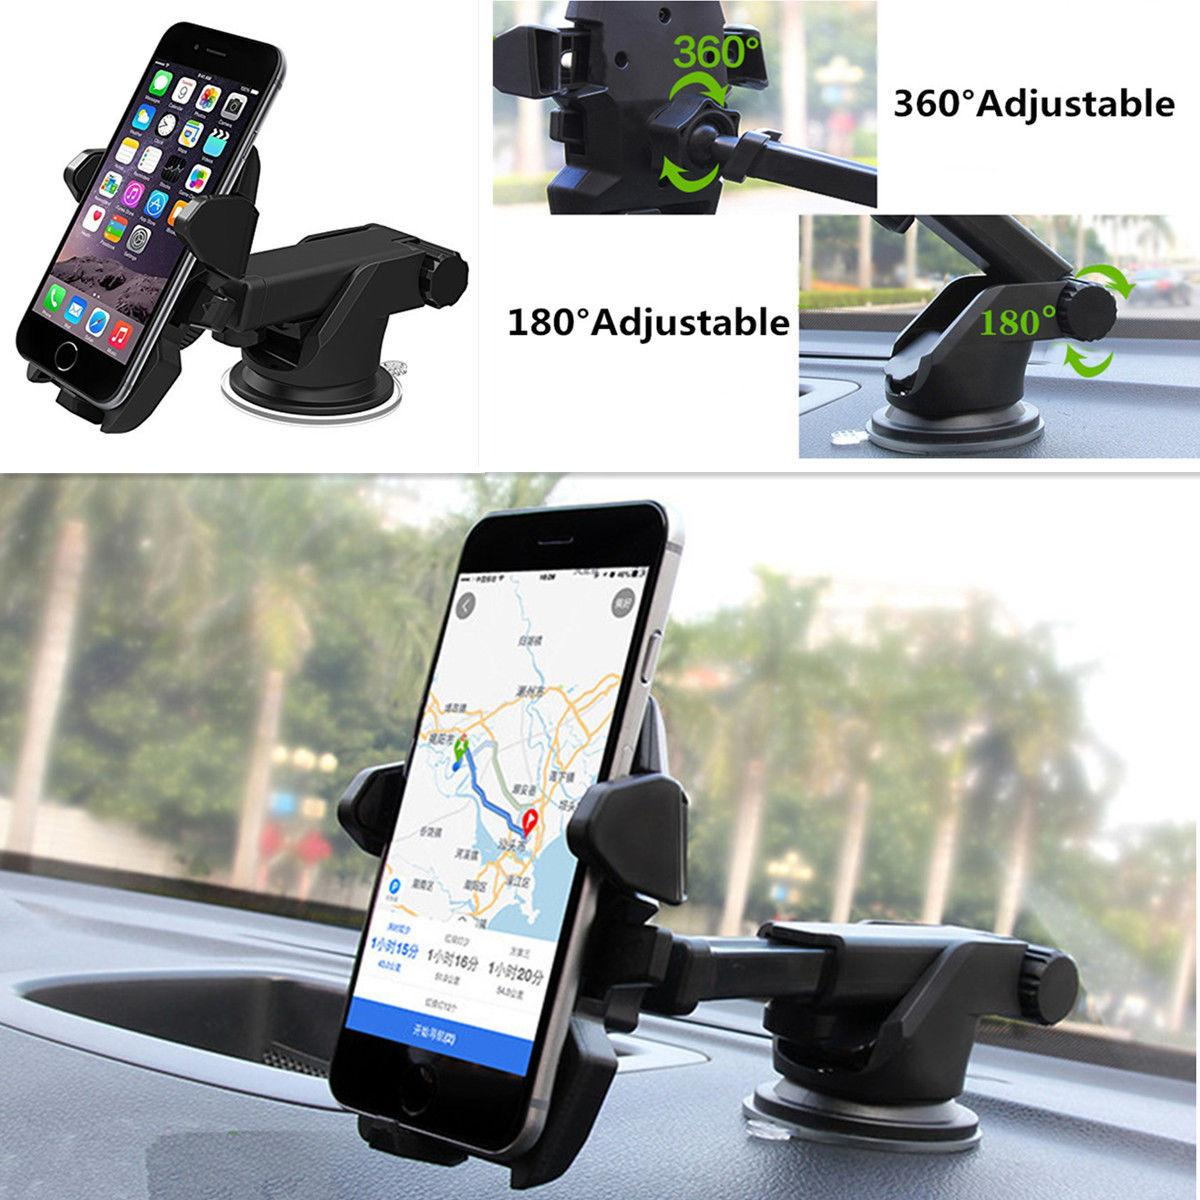 360 ° ajustable One Touch parabrisas coche ventosa soporte teléfono soporte GPS Stand Holder